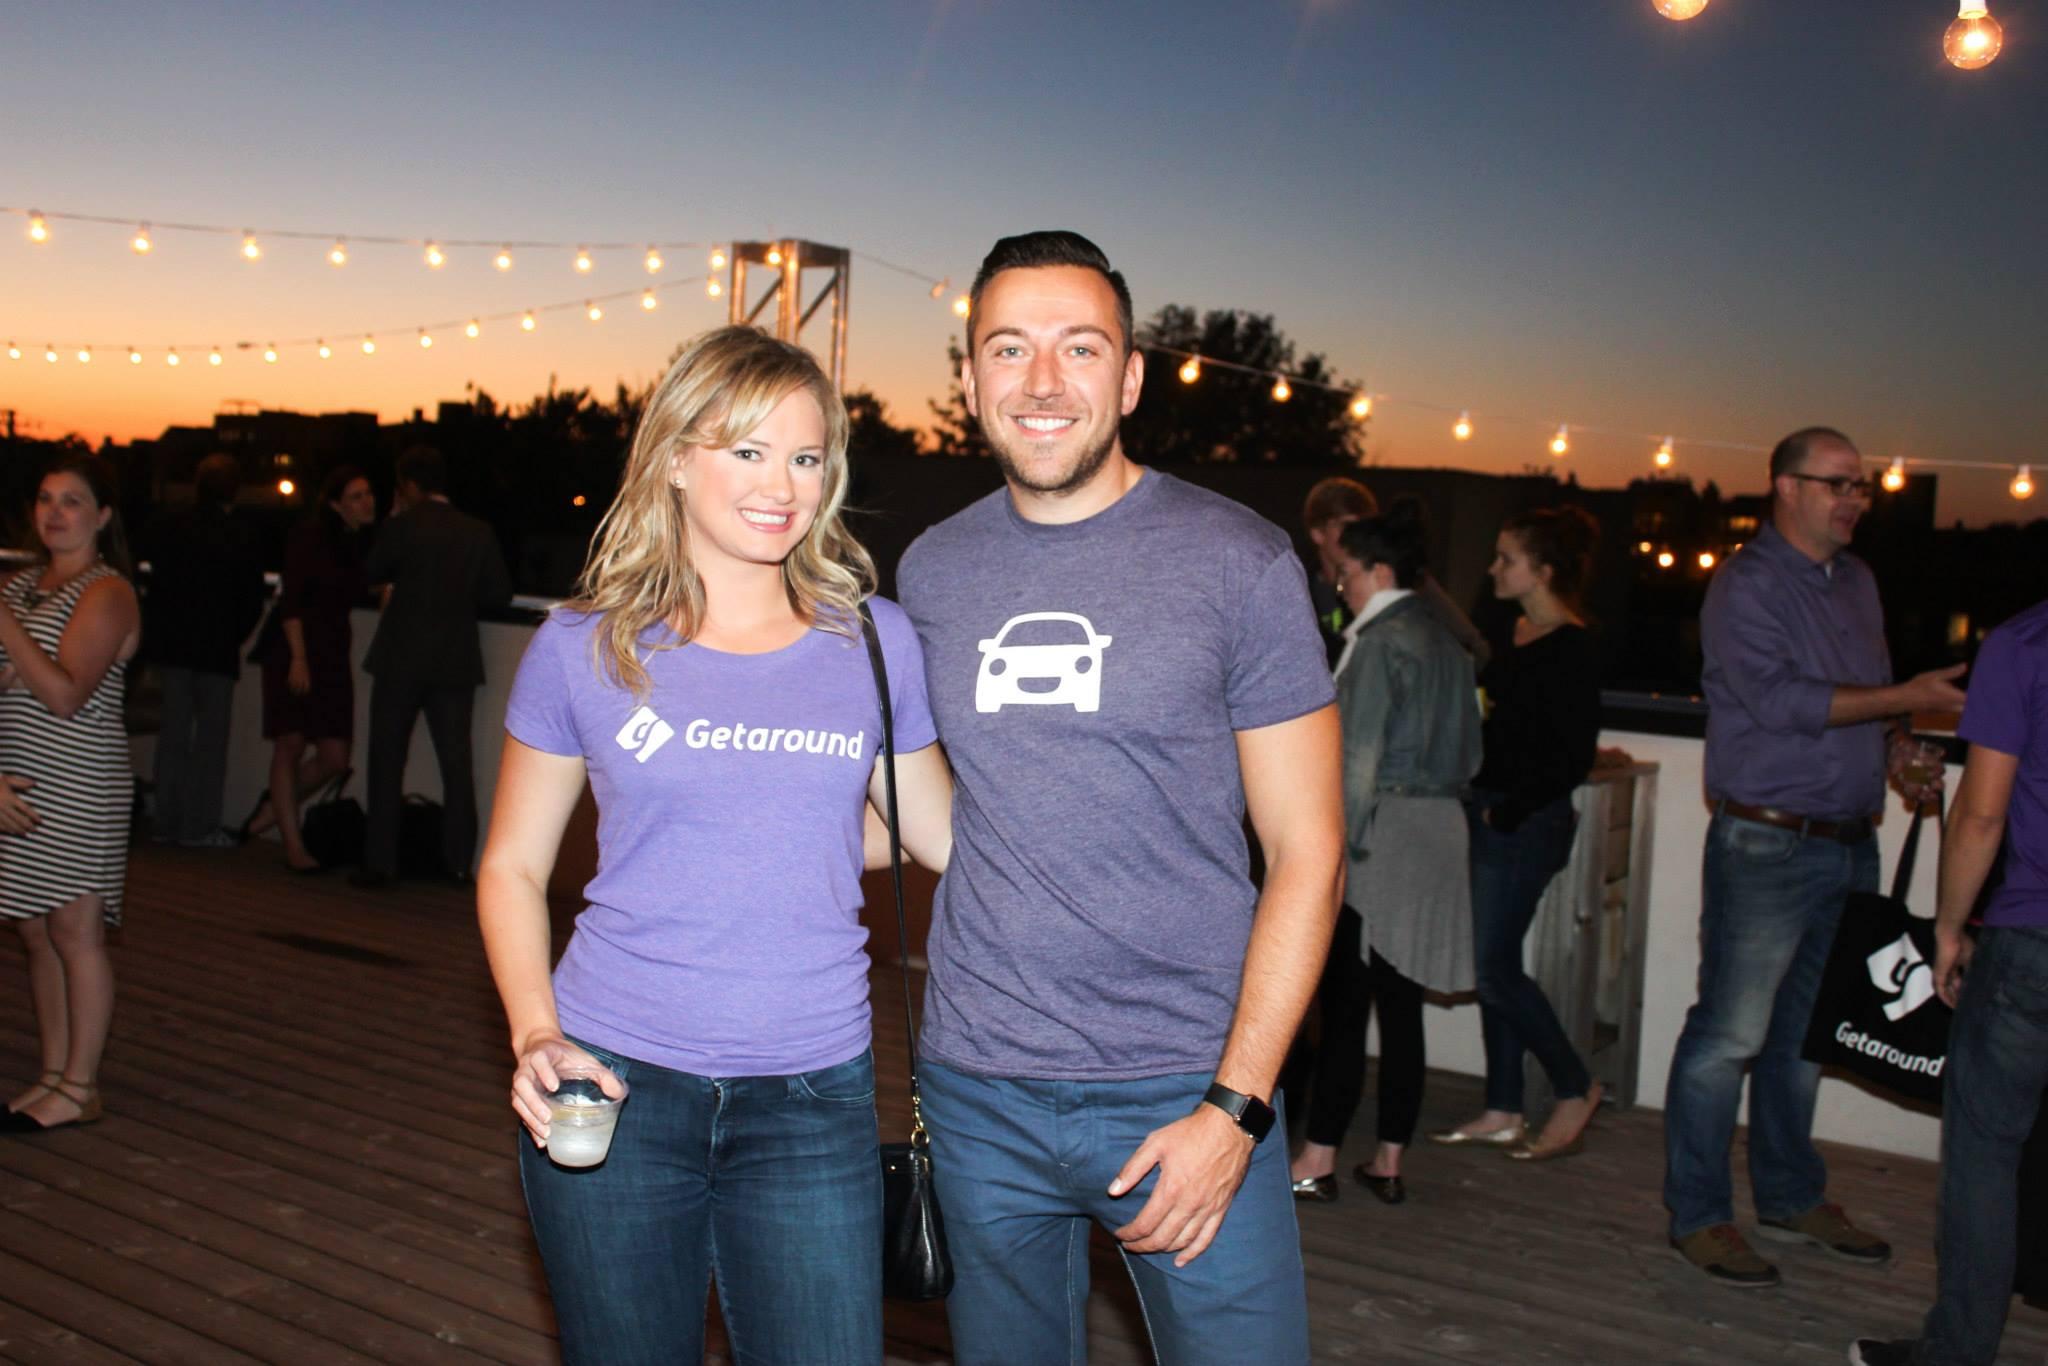 Jessica Scorpio, Getaround VP Marketing and Sam Zaid Getaround CEO